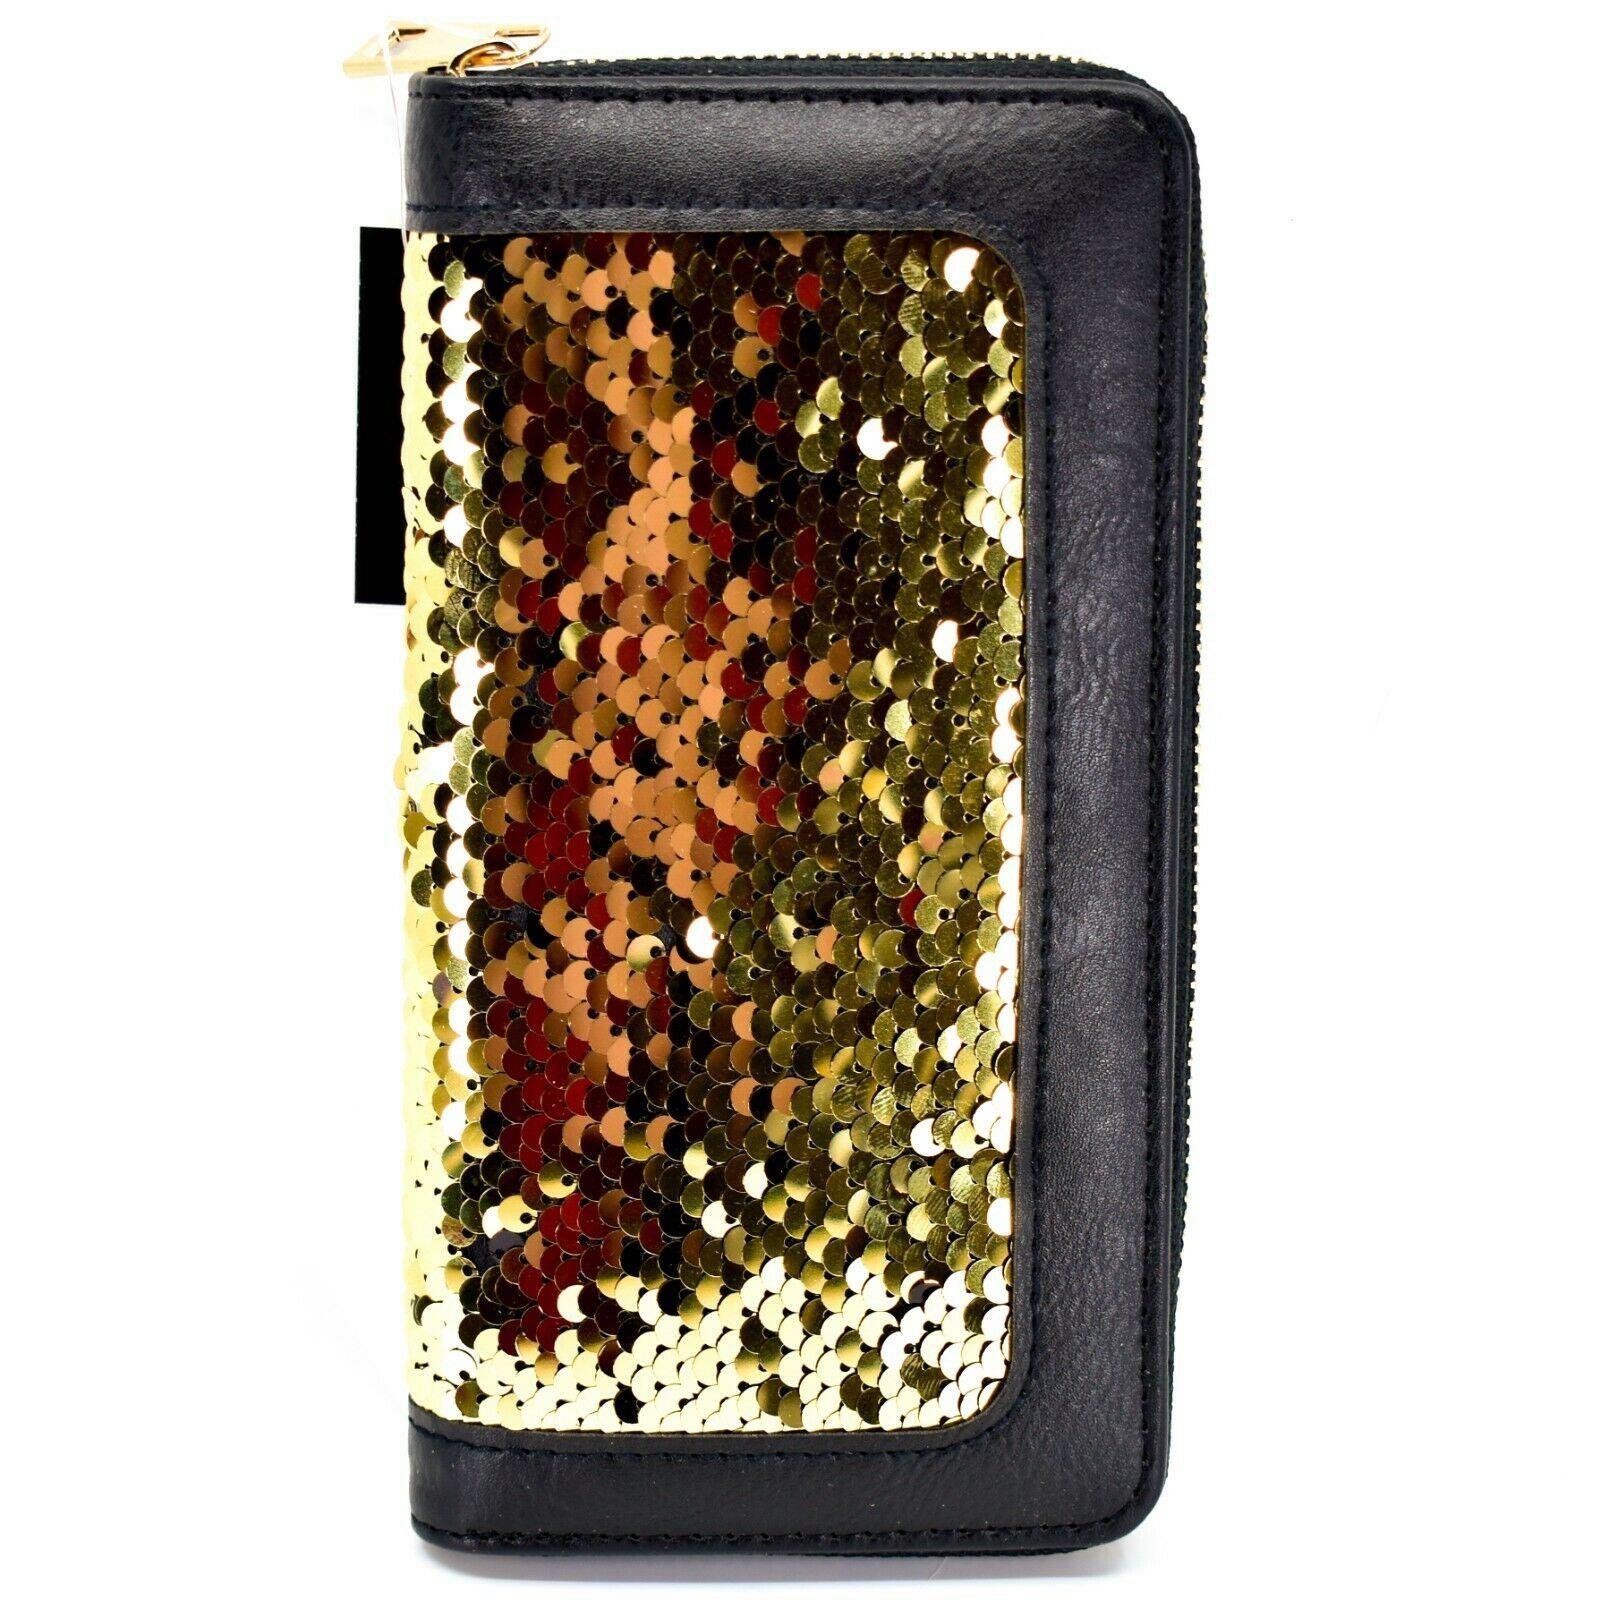 Bijorca Faux Leather Black & Gold Sequin Zip Around Clutch Wallet